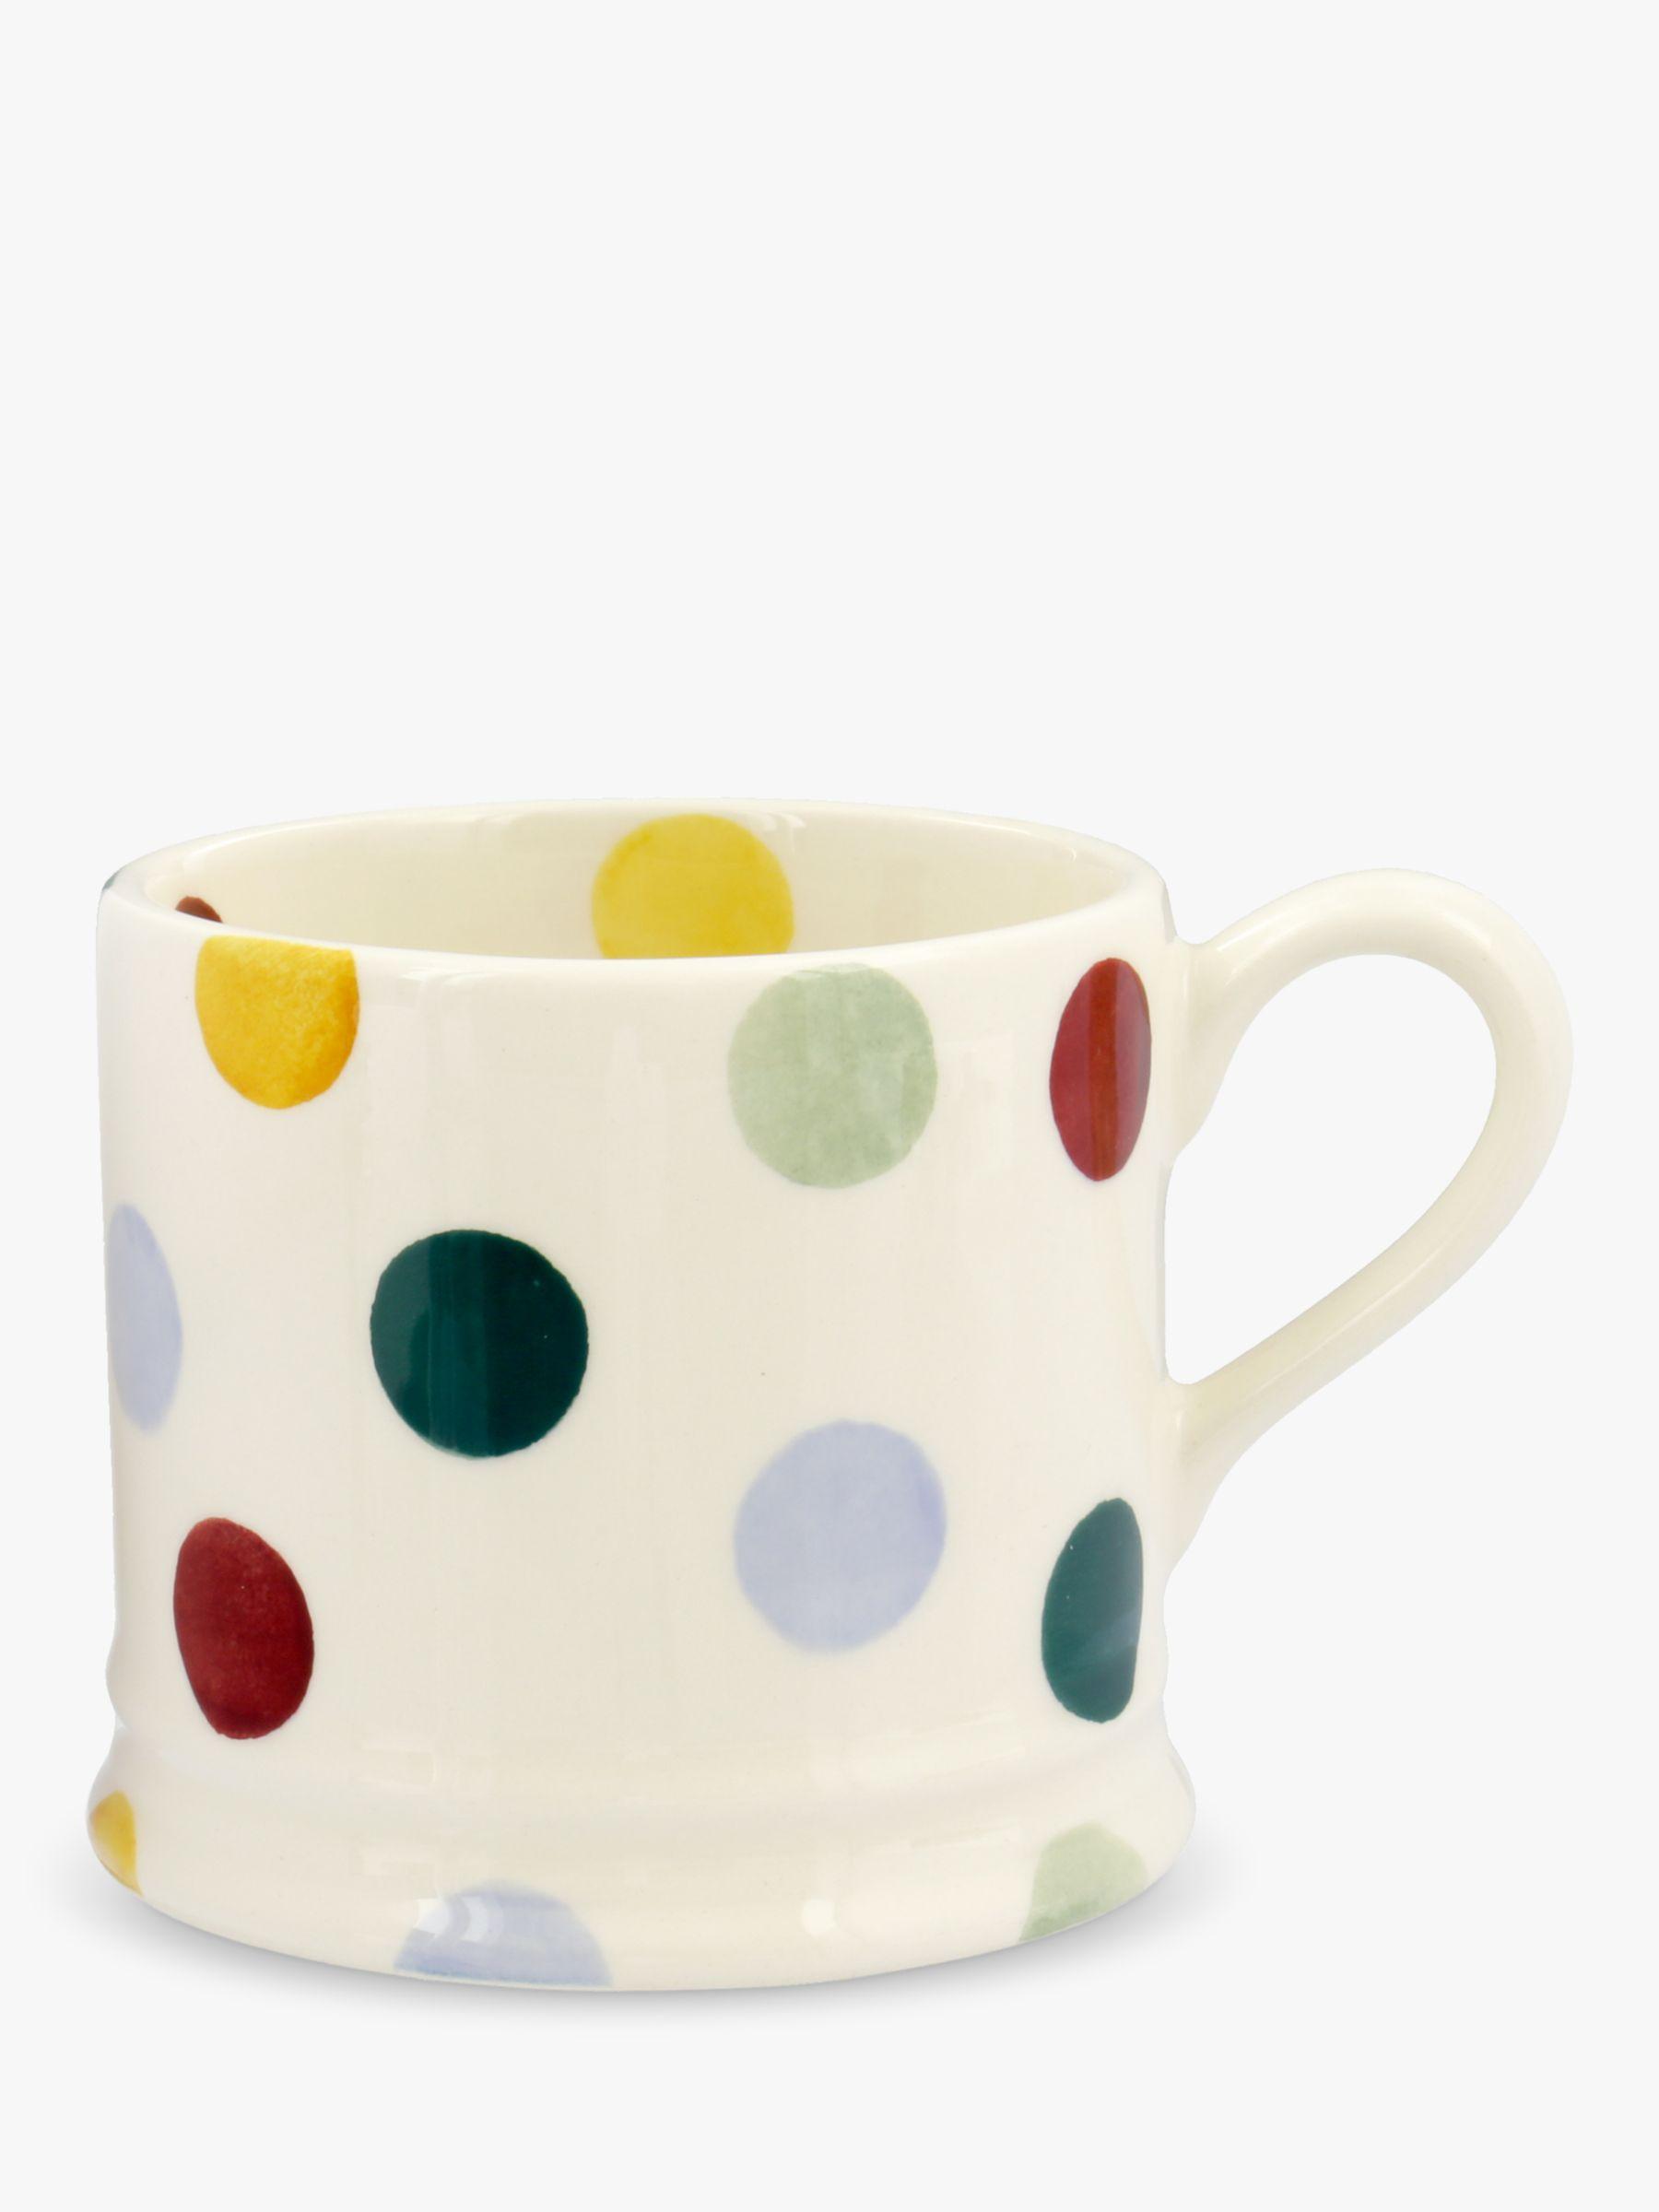 Emma Bridgewater Polka Dot Small Mug, 142ml, Multi